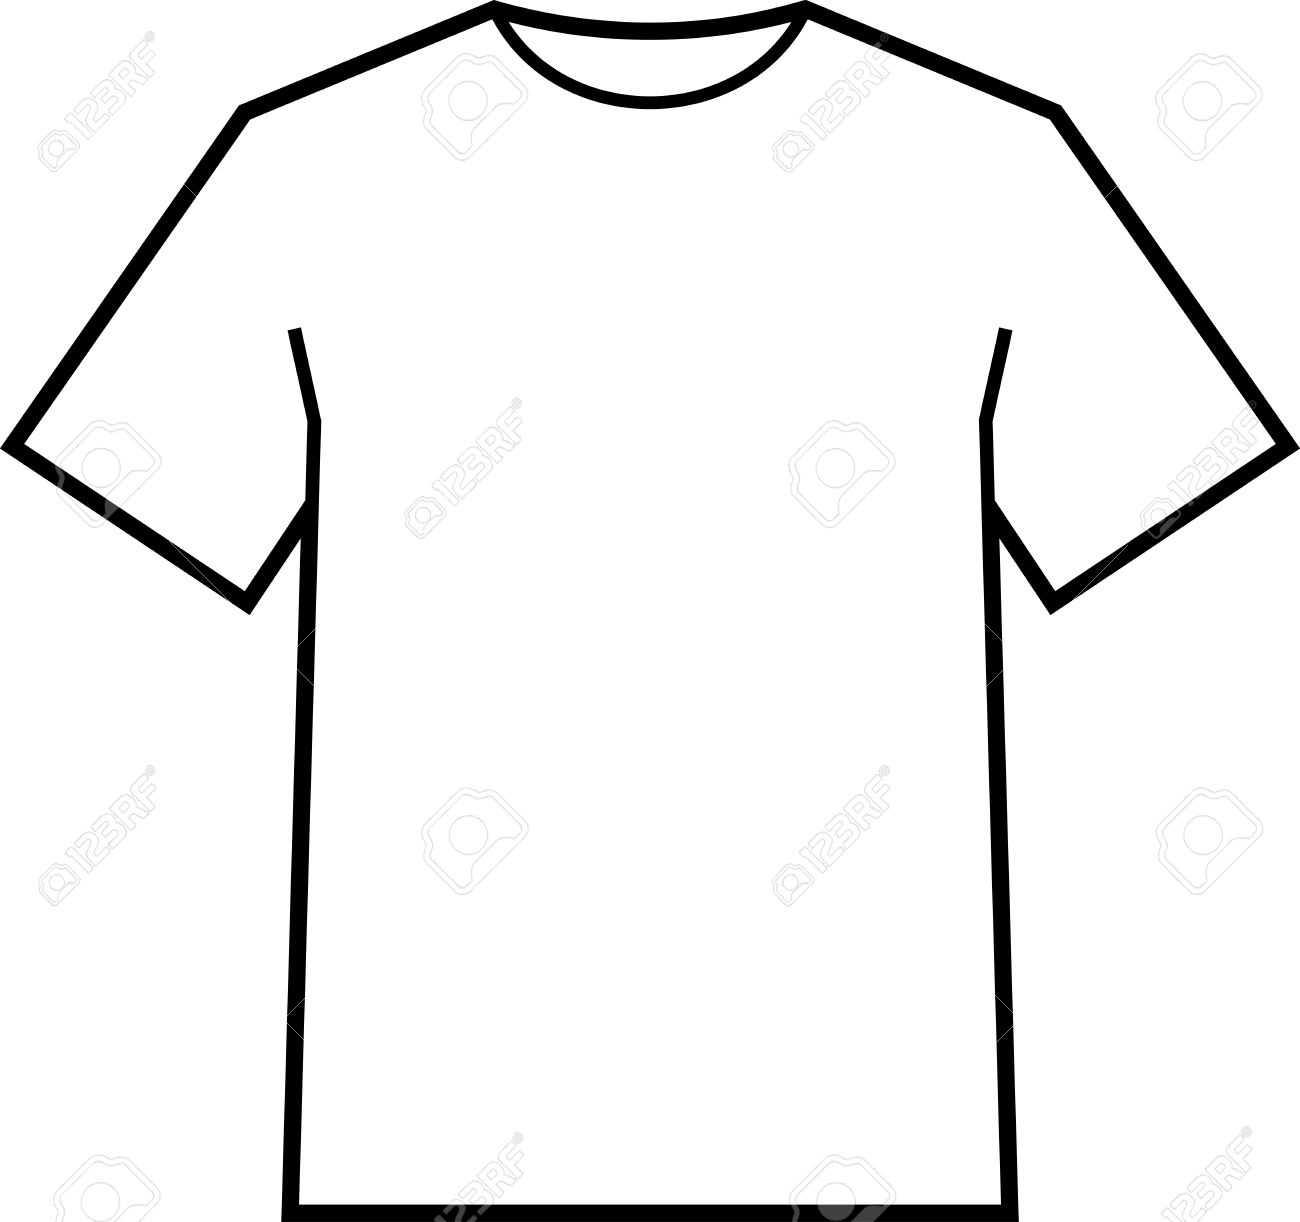 Blank T Shirt Template Vector Pertaining To Blank Tee Shirt Template